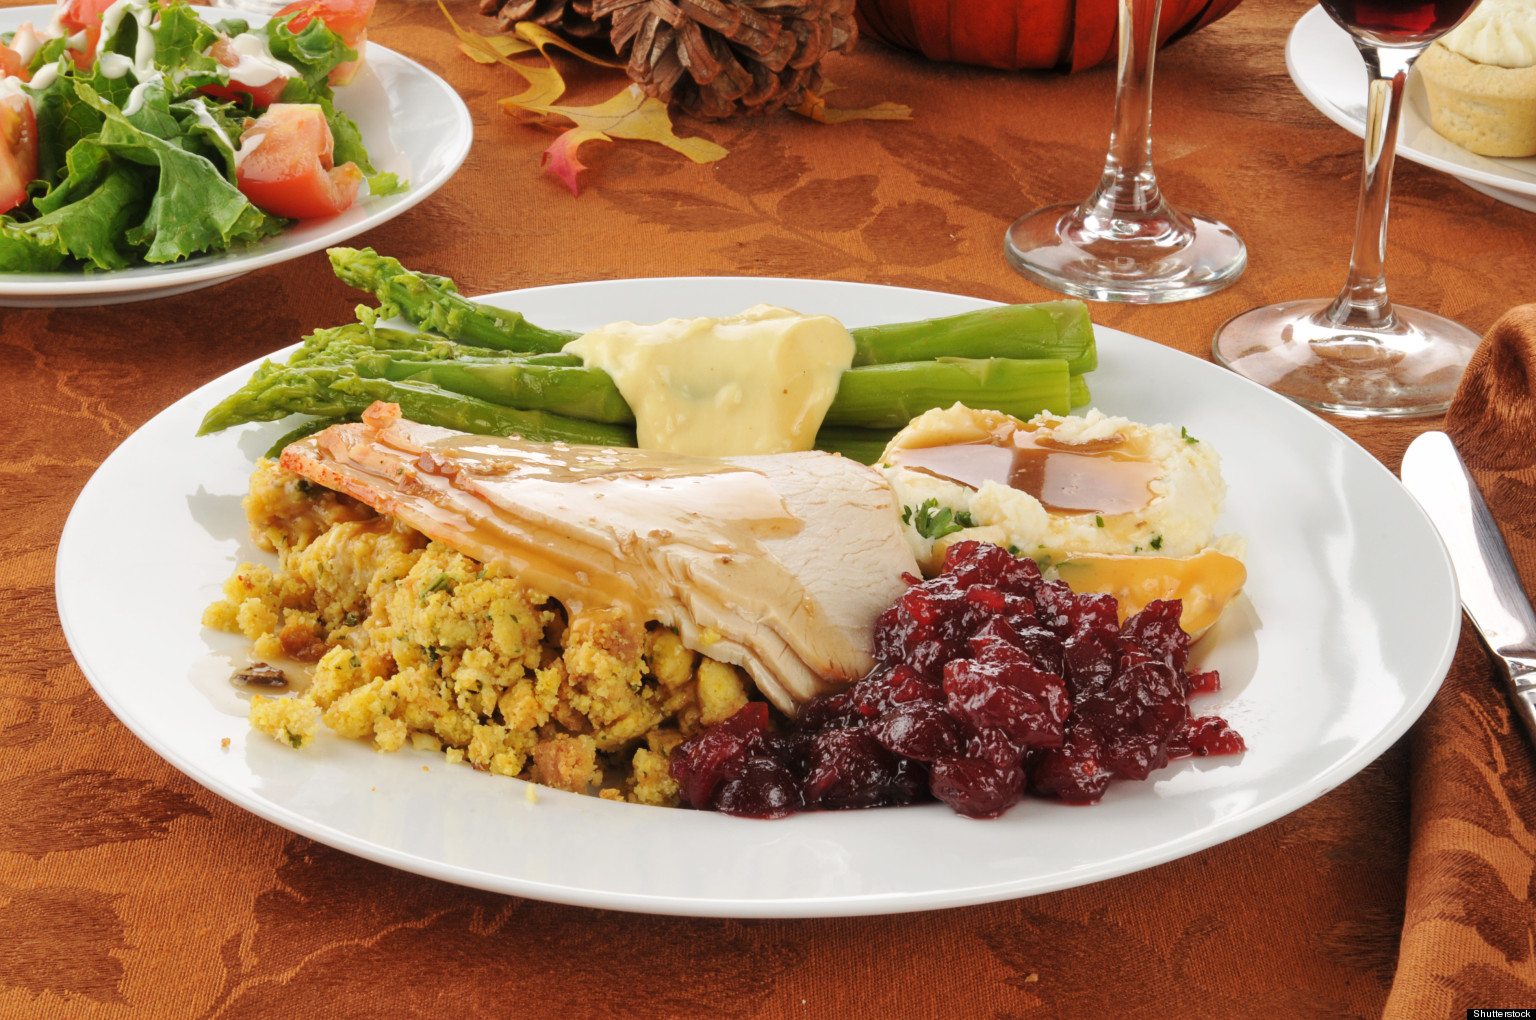 Http Www Huffingtonpost Com 2012 11 21 Cheap Thanksgiving Dinner Turkey Target Walmart Whole Foods N 2170787 Html